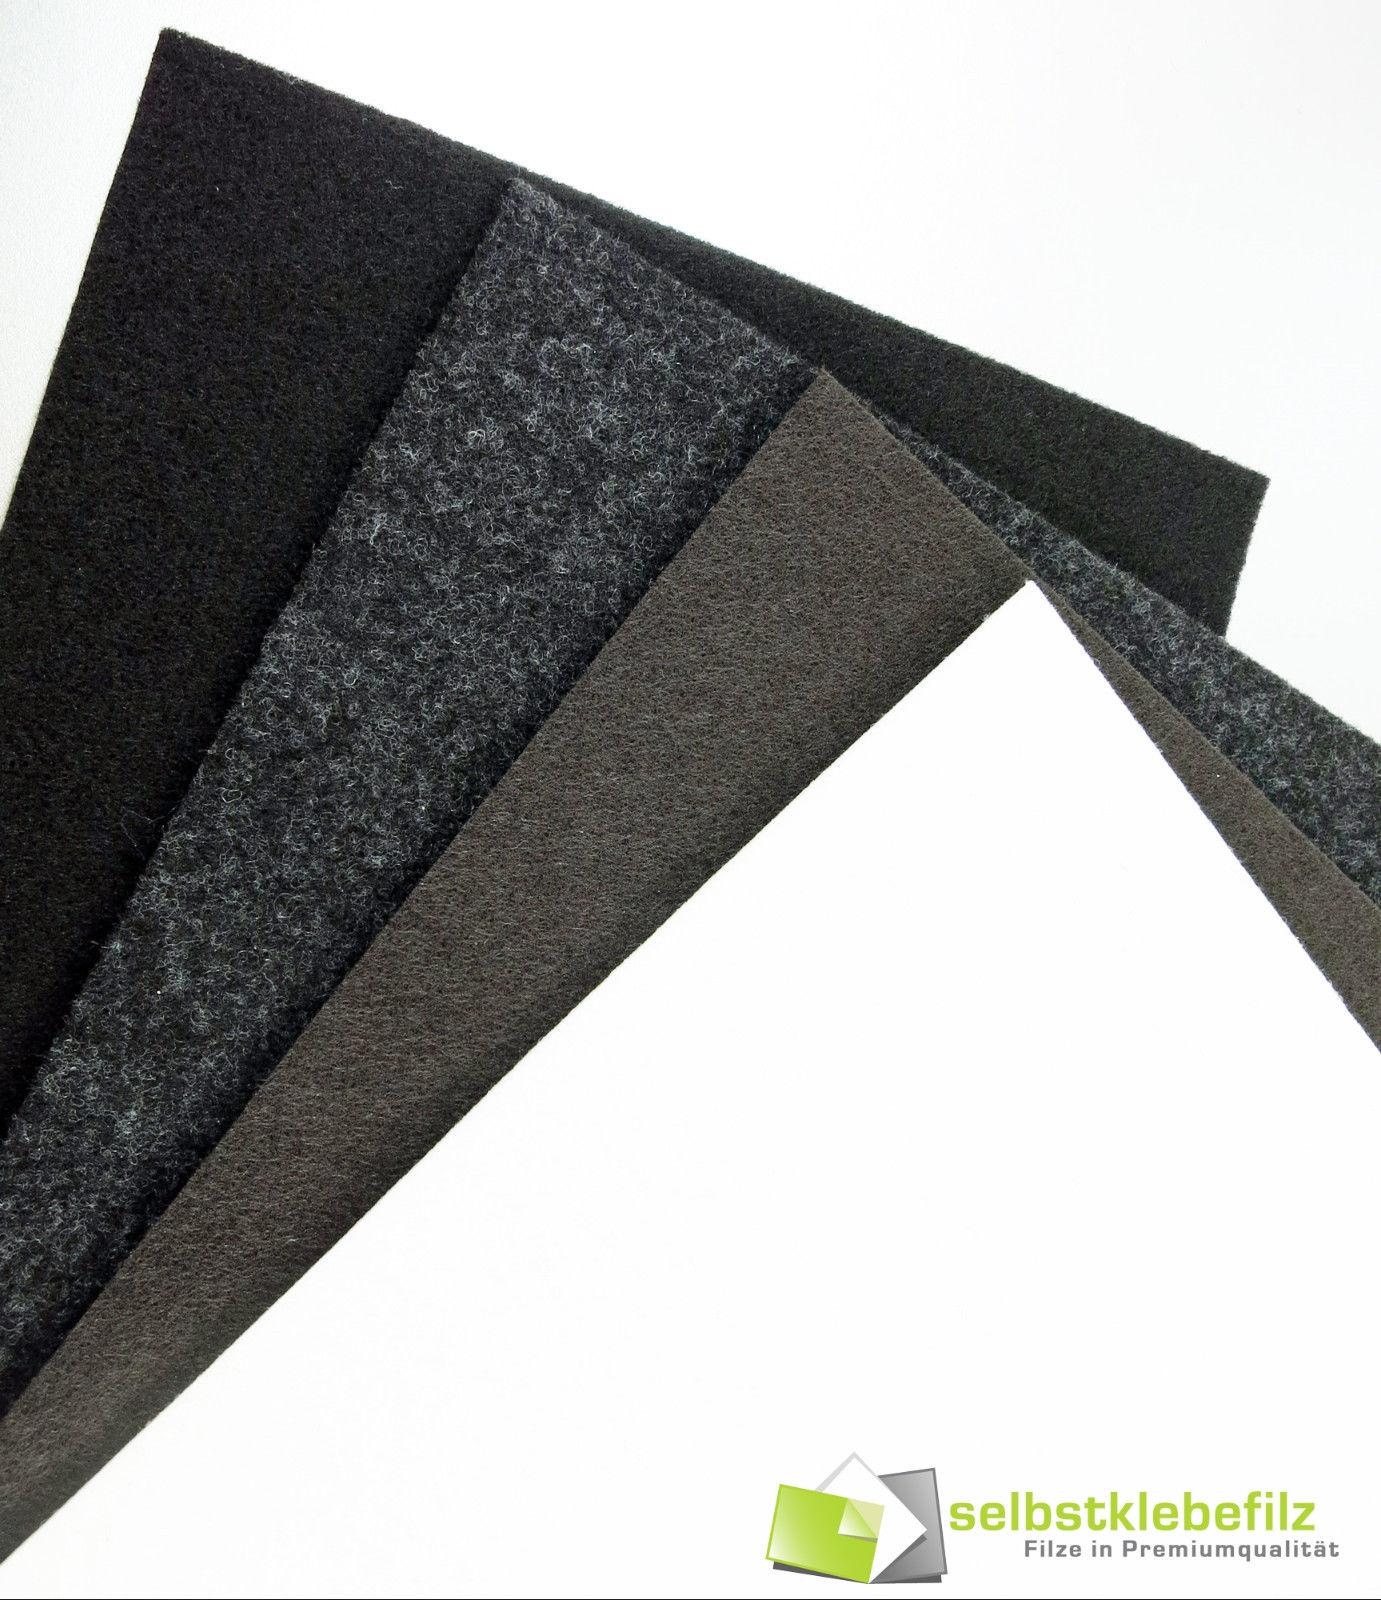 Filzplatte quadratisch, stark selbstklebend 5x5 - 90x90cm, Filzgleiter Filz 3mm